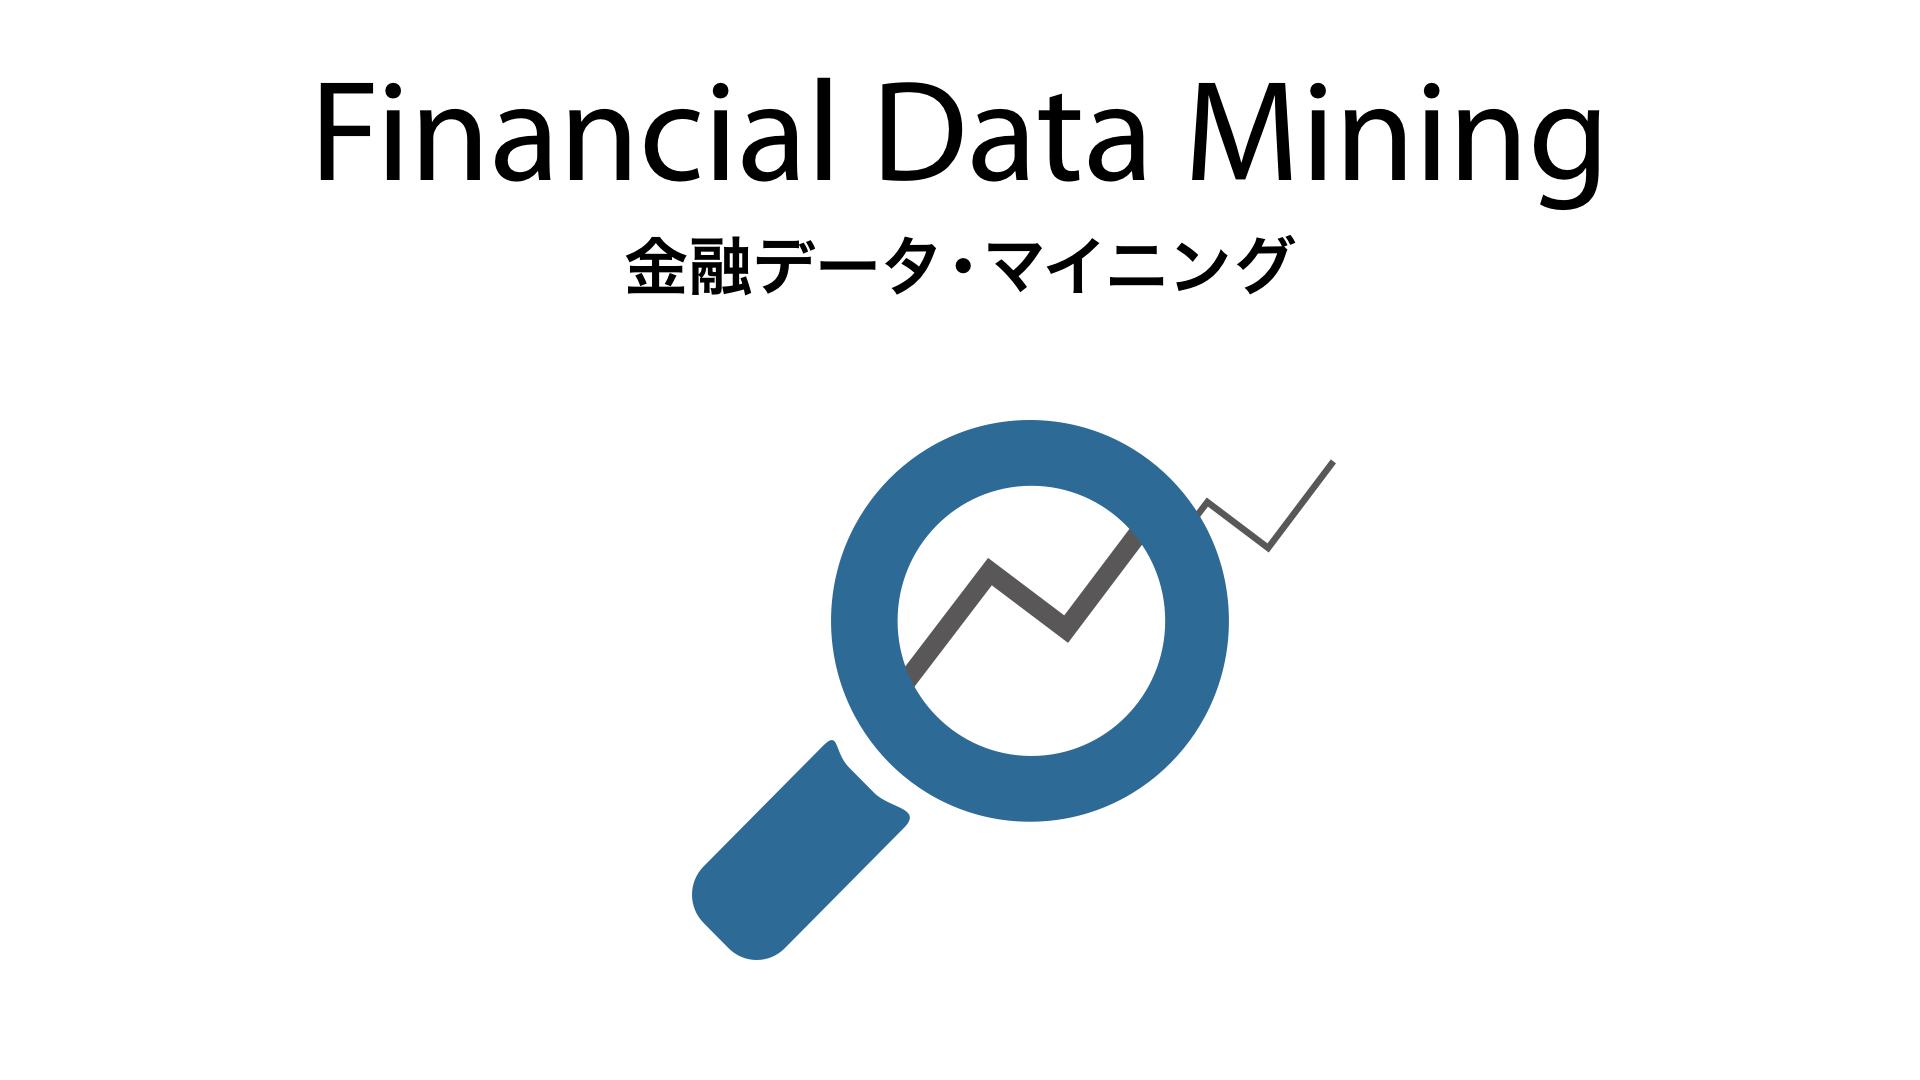 financial_data_mining.png